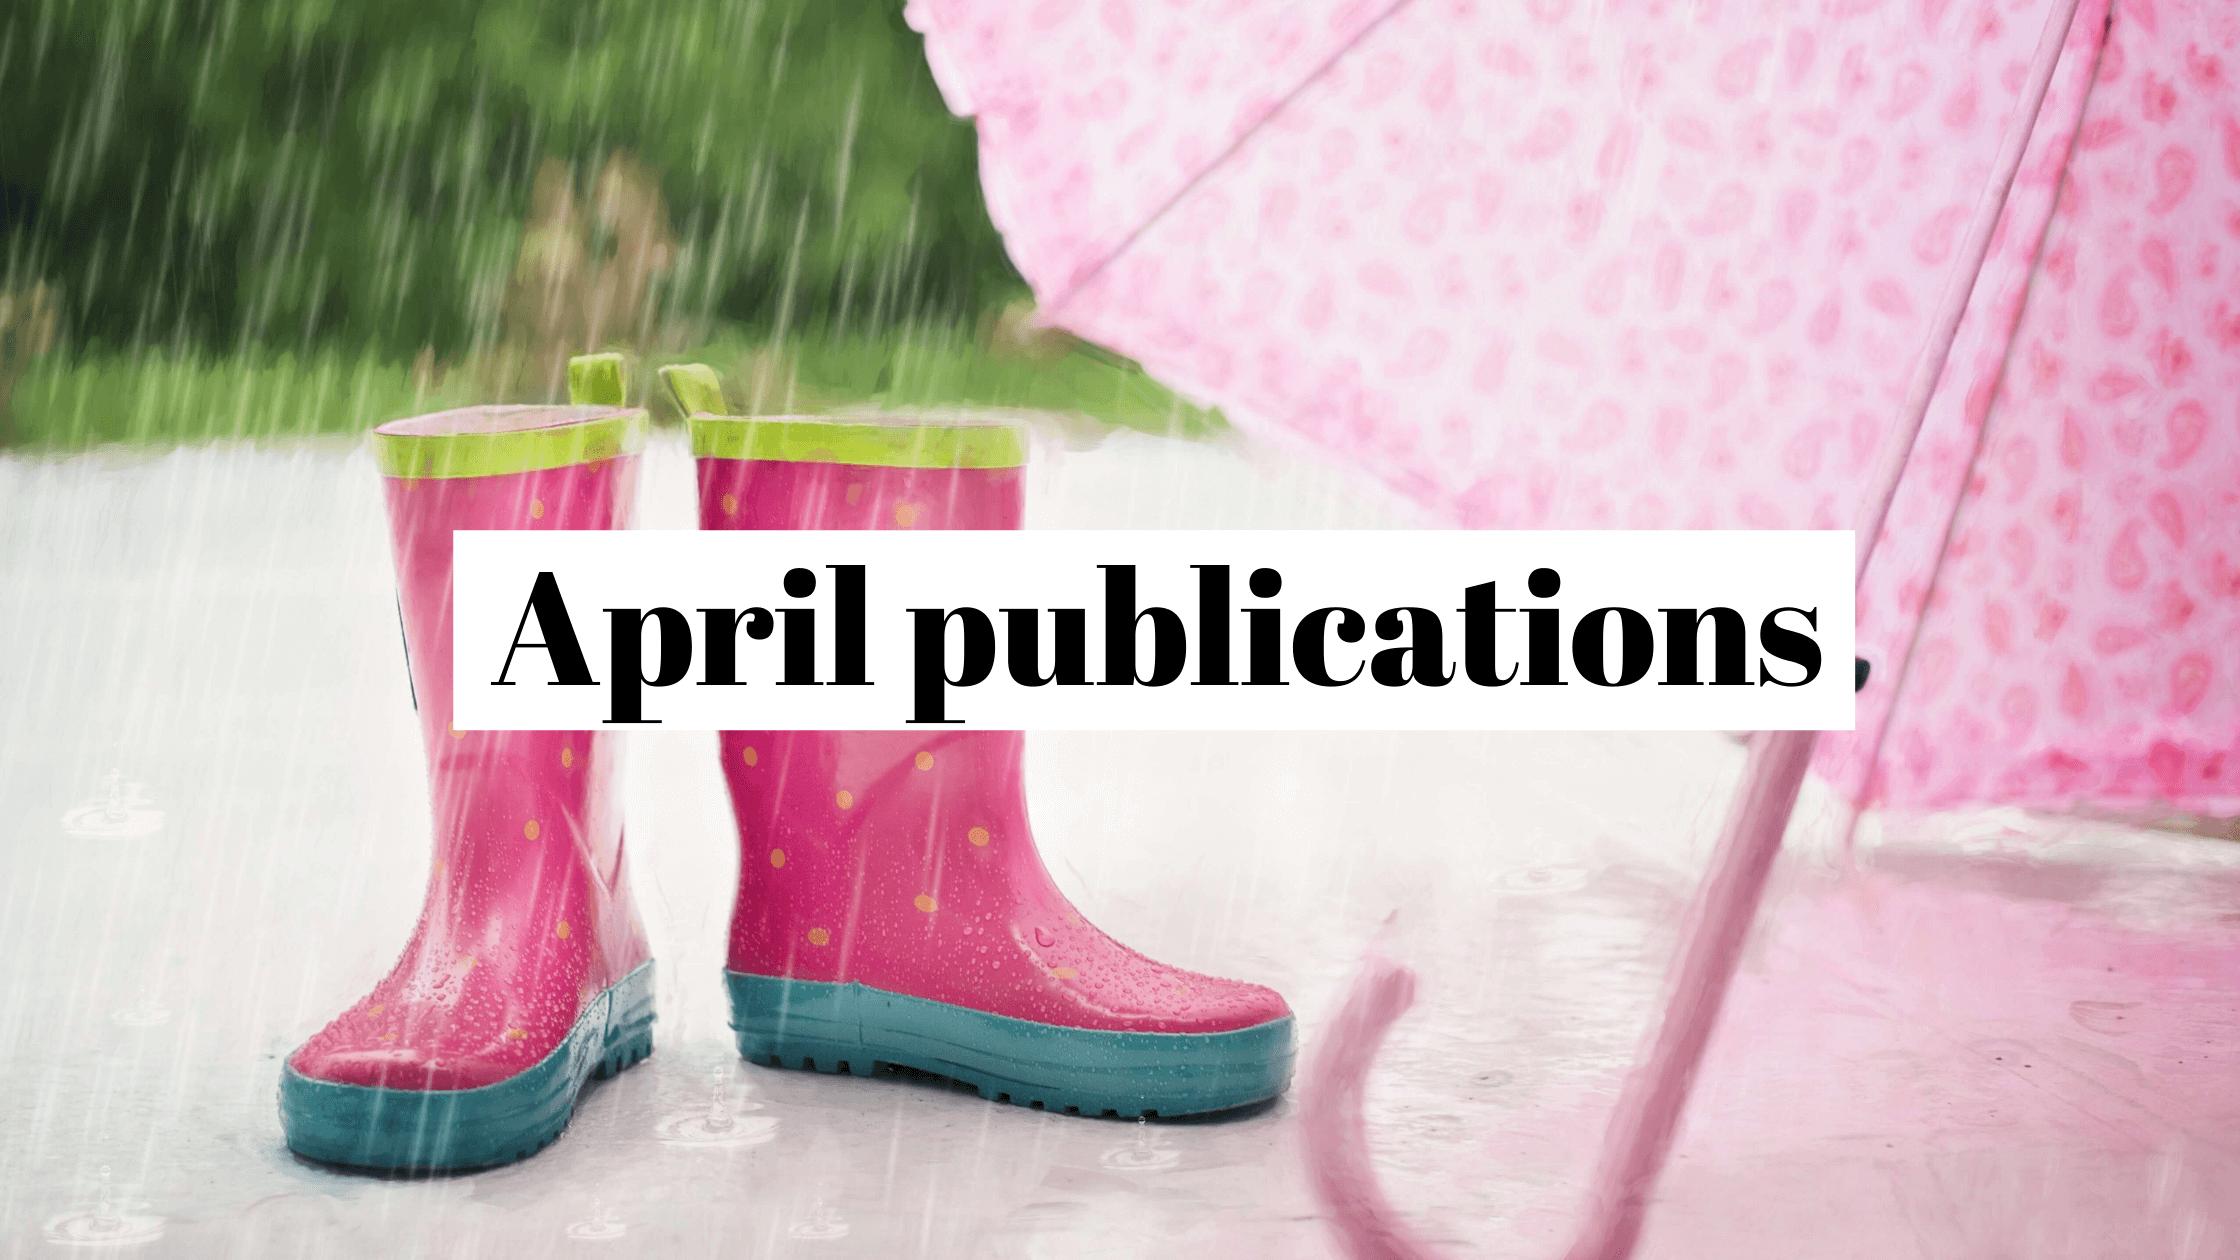 April, when we made publications rain